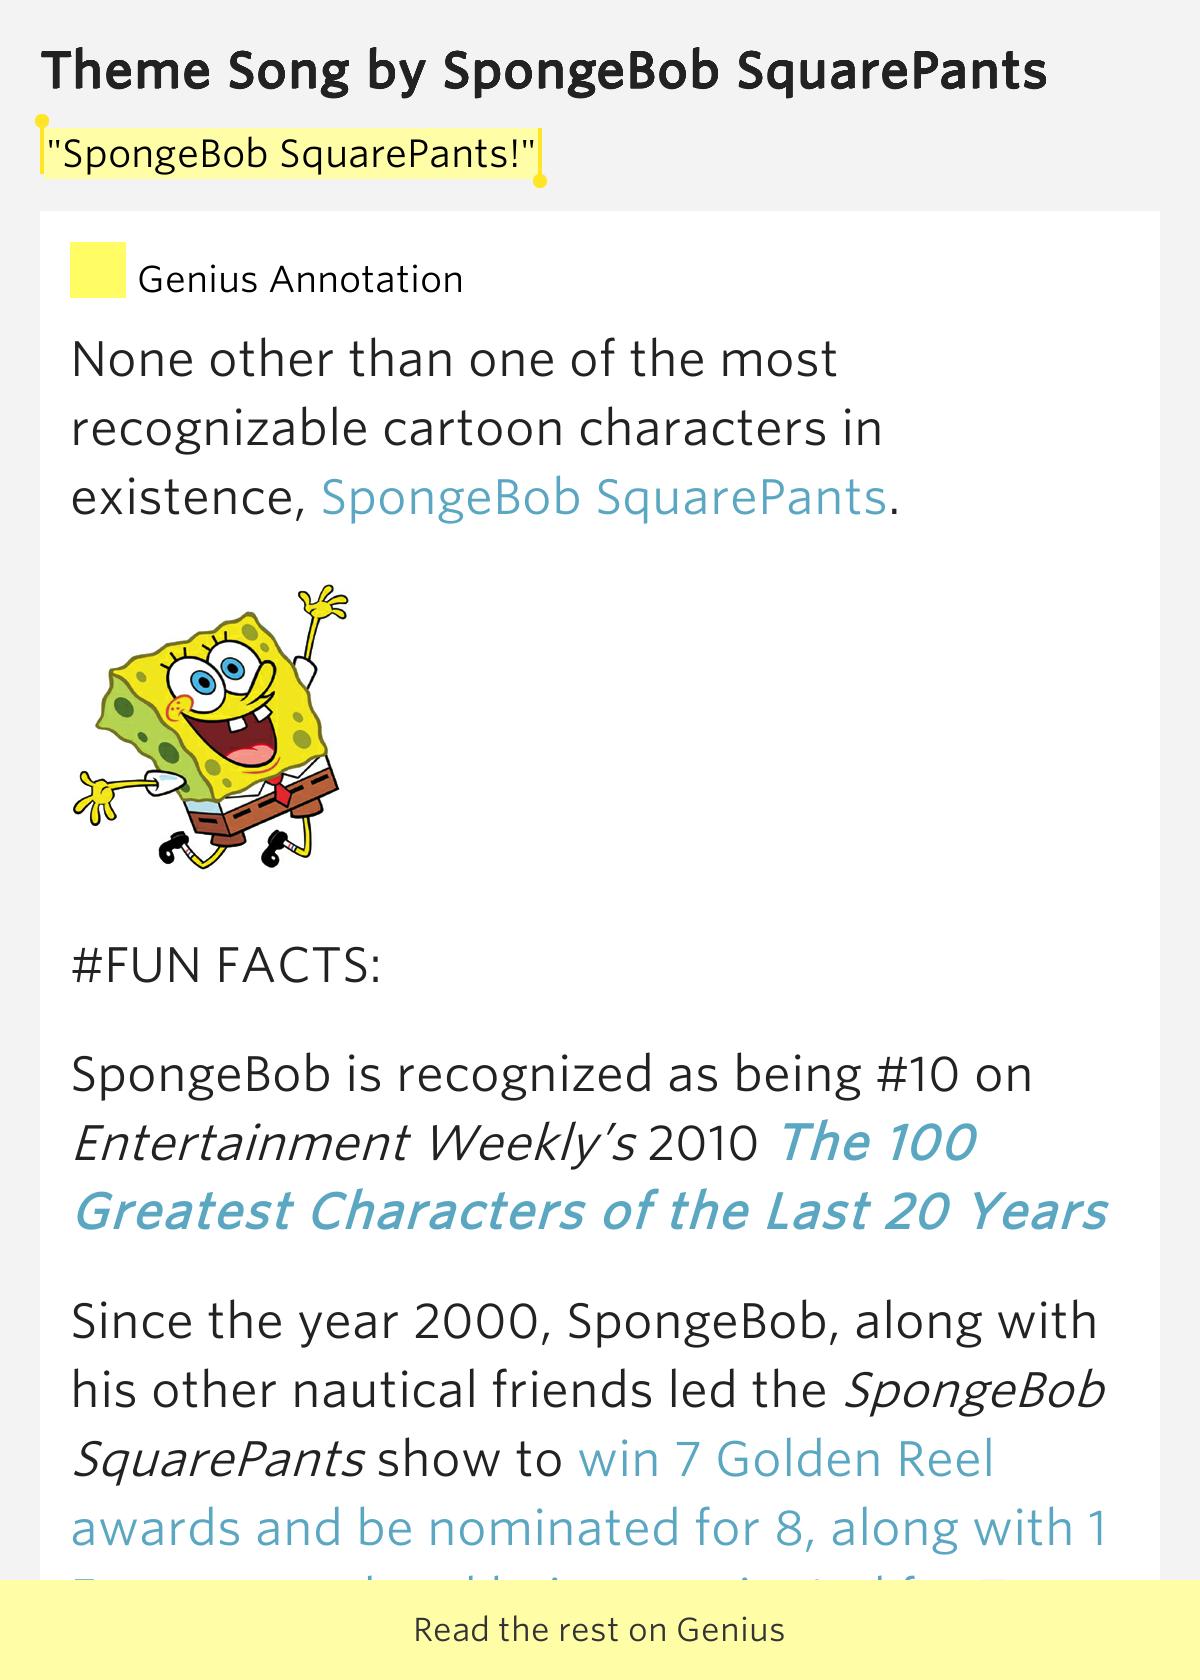 """SpongeBob SquarePants!"" – Theme Song by SpongeBob SquarePants"